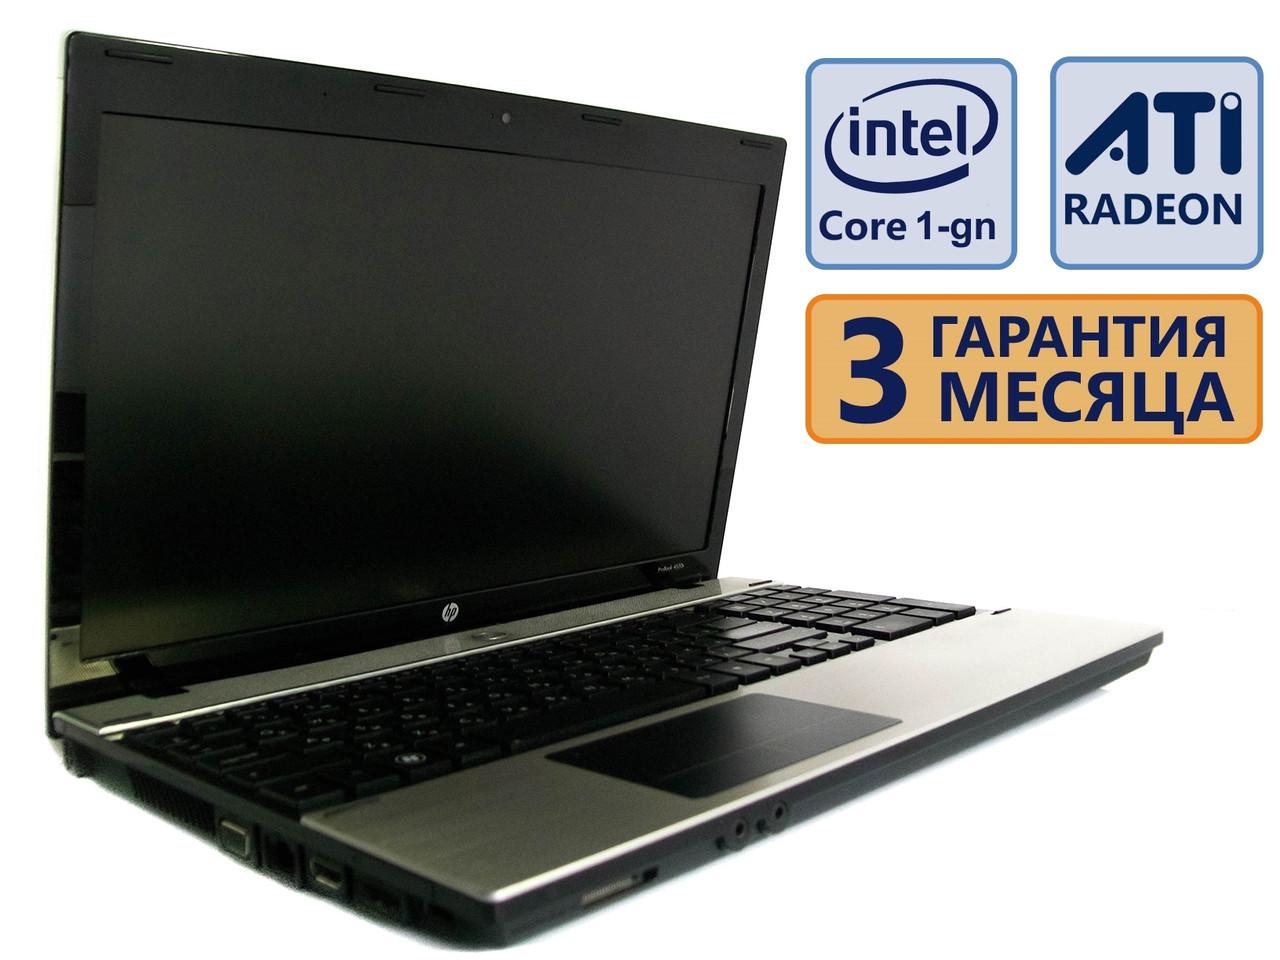 Ноутбук HP Probook 4520s 15.6 (1366x768), Intel Core i3... i5-1gn, Radeon HD 5470, RAM 2-8Gb, HDD 0-500GB БУ